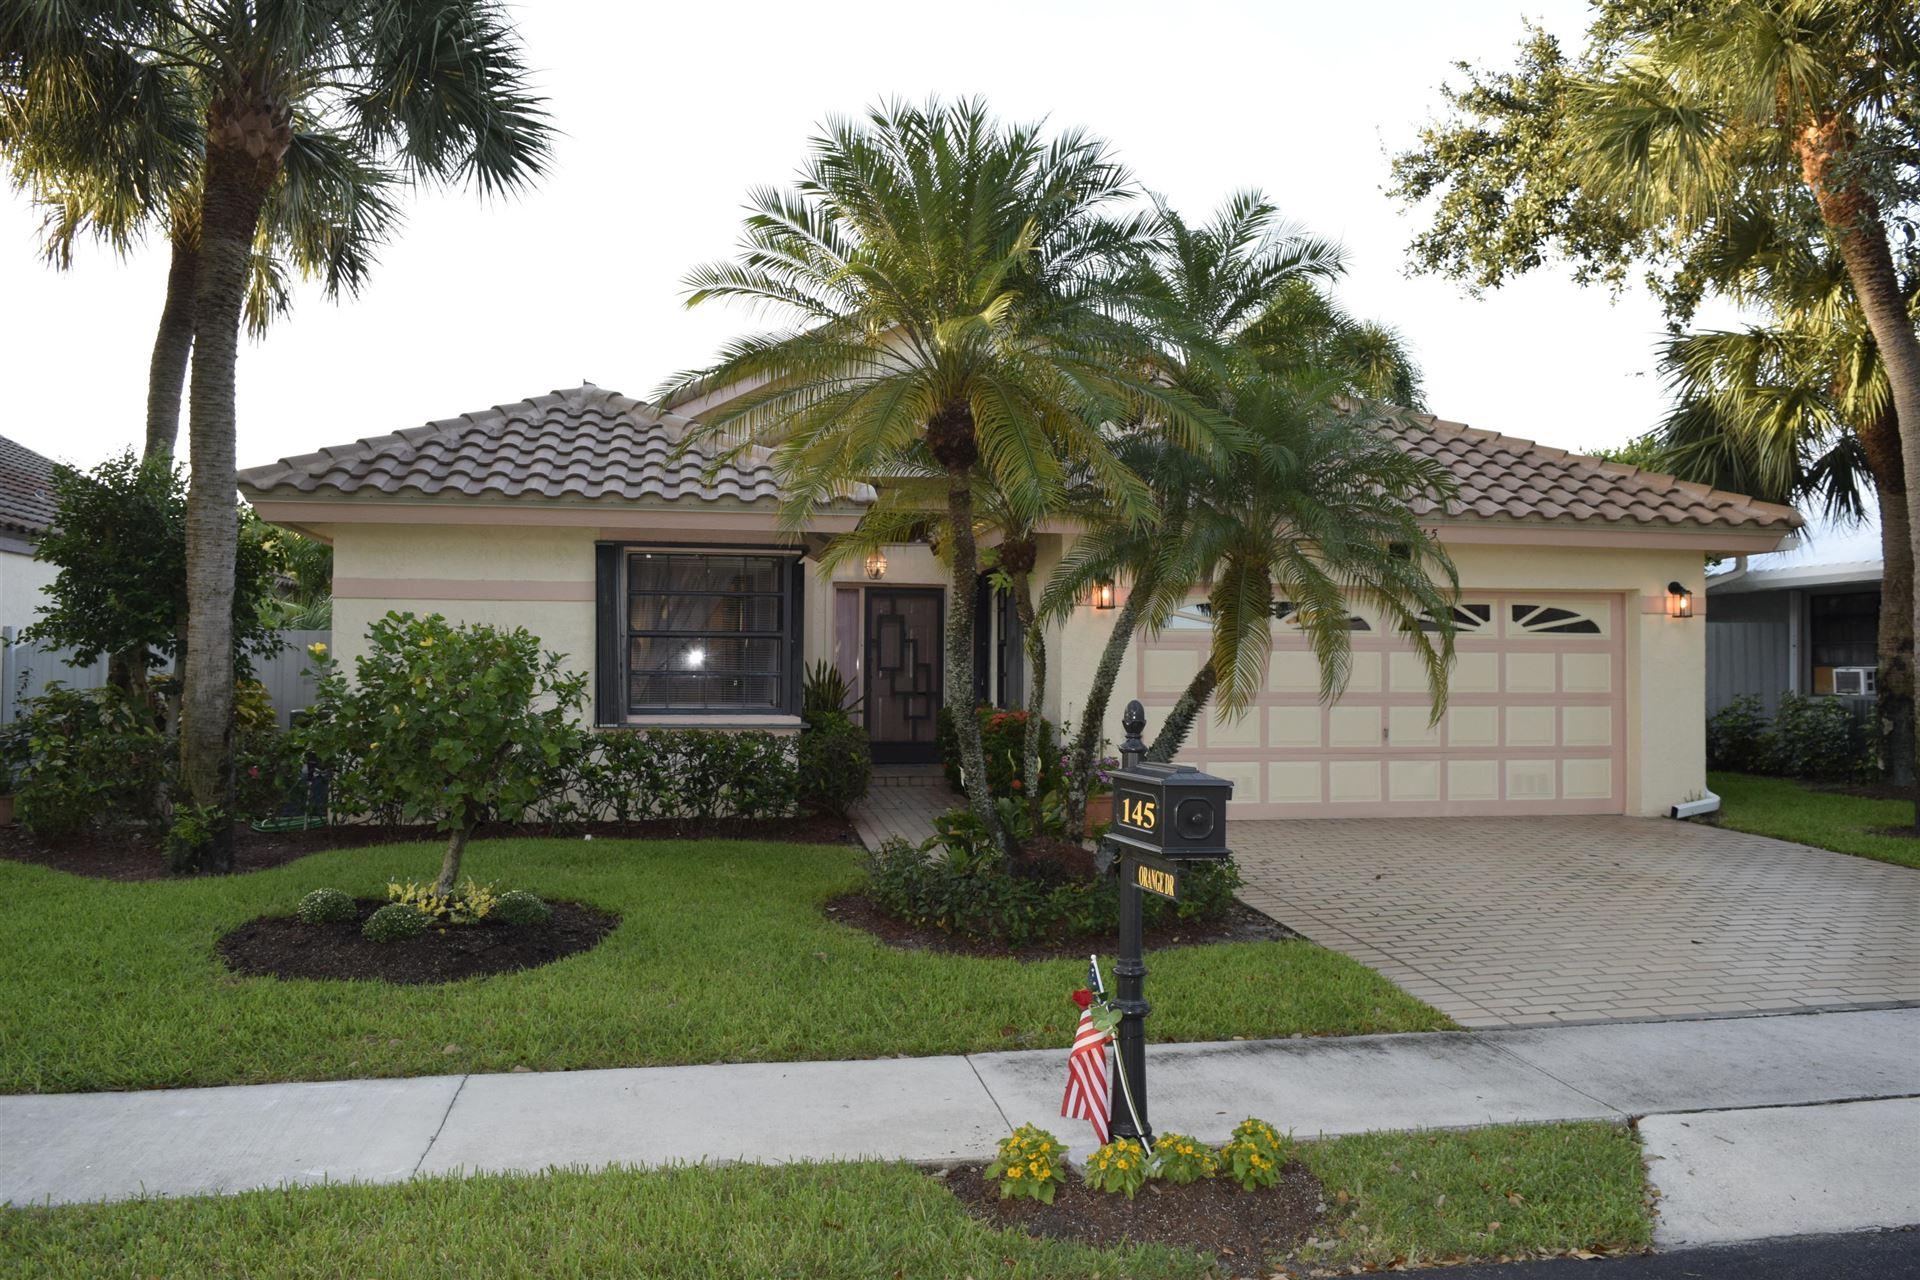 145 Orange Drive, Boynton Beach, FL 33436 - #: RX-10651143